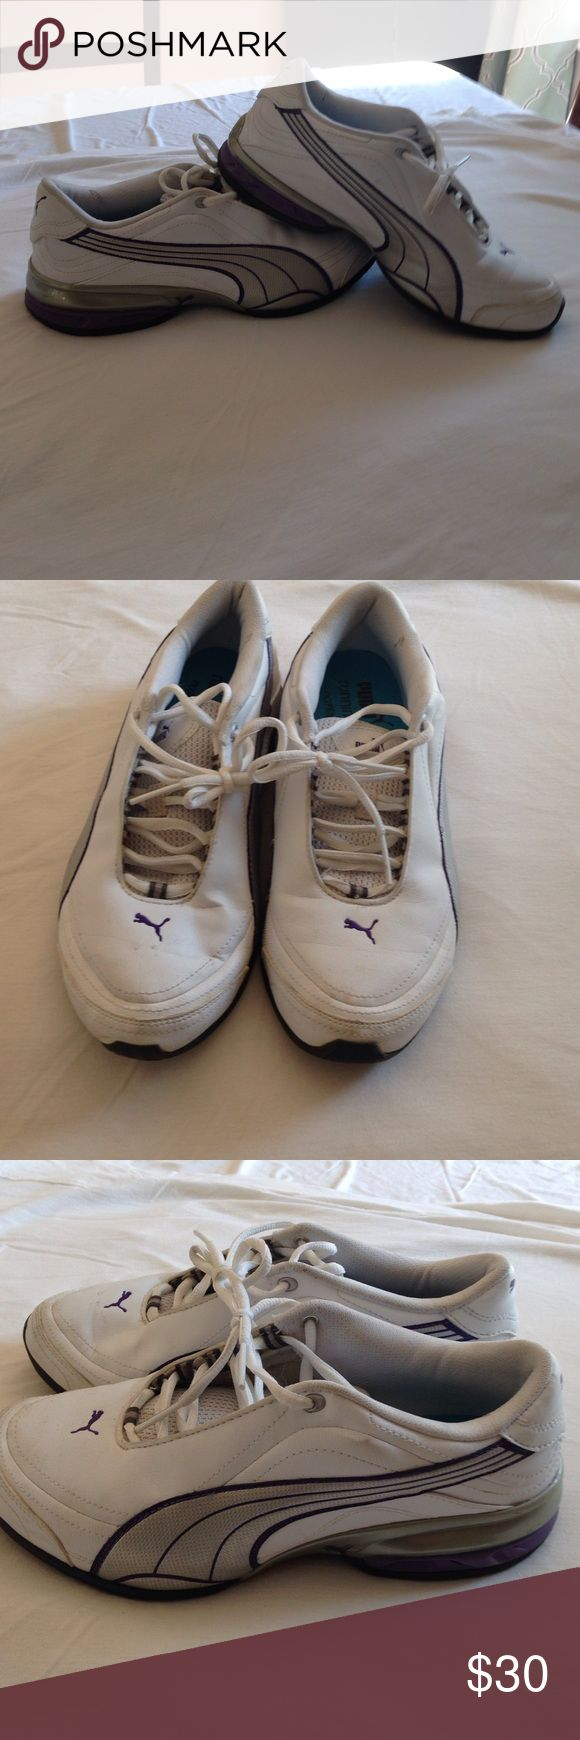 Puma Tennis Shoes Slightly used Puma Tennis Shoes. Purple, silver, and white. Puma Shoes Athletic Shoes